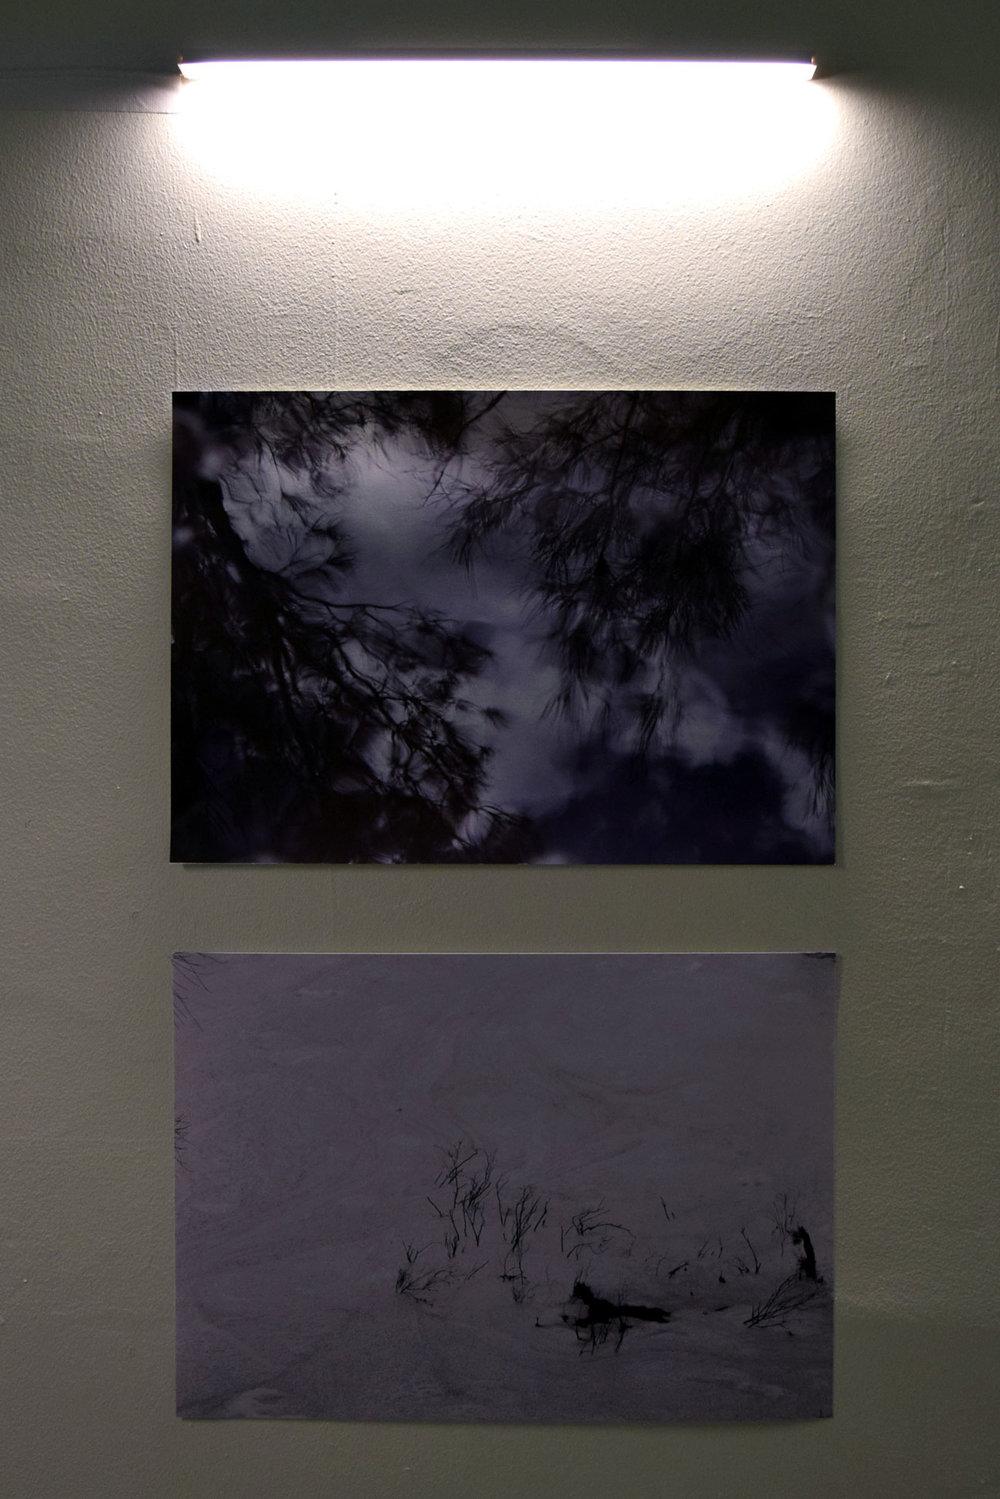 9 - 10. Tessa Beale, Snow; Bina Butcher, Waver, 2018, Digital Print, $200